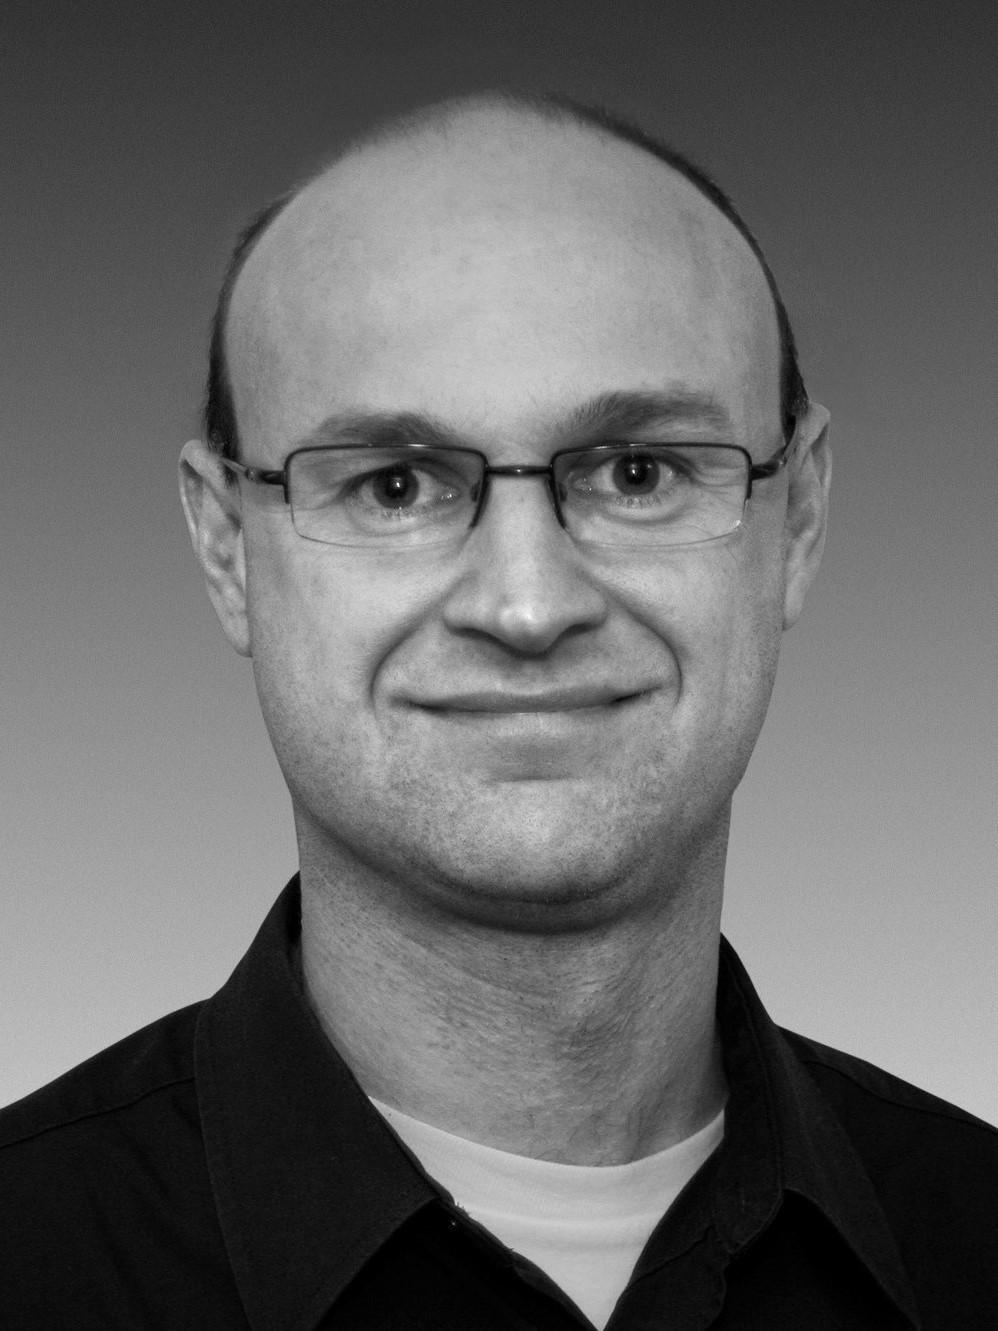 Dave McIlhagga